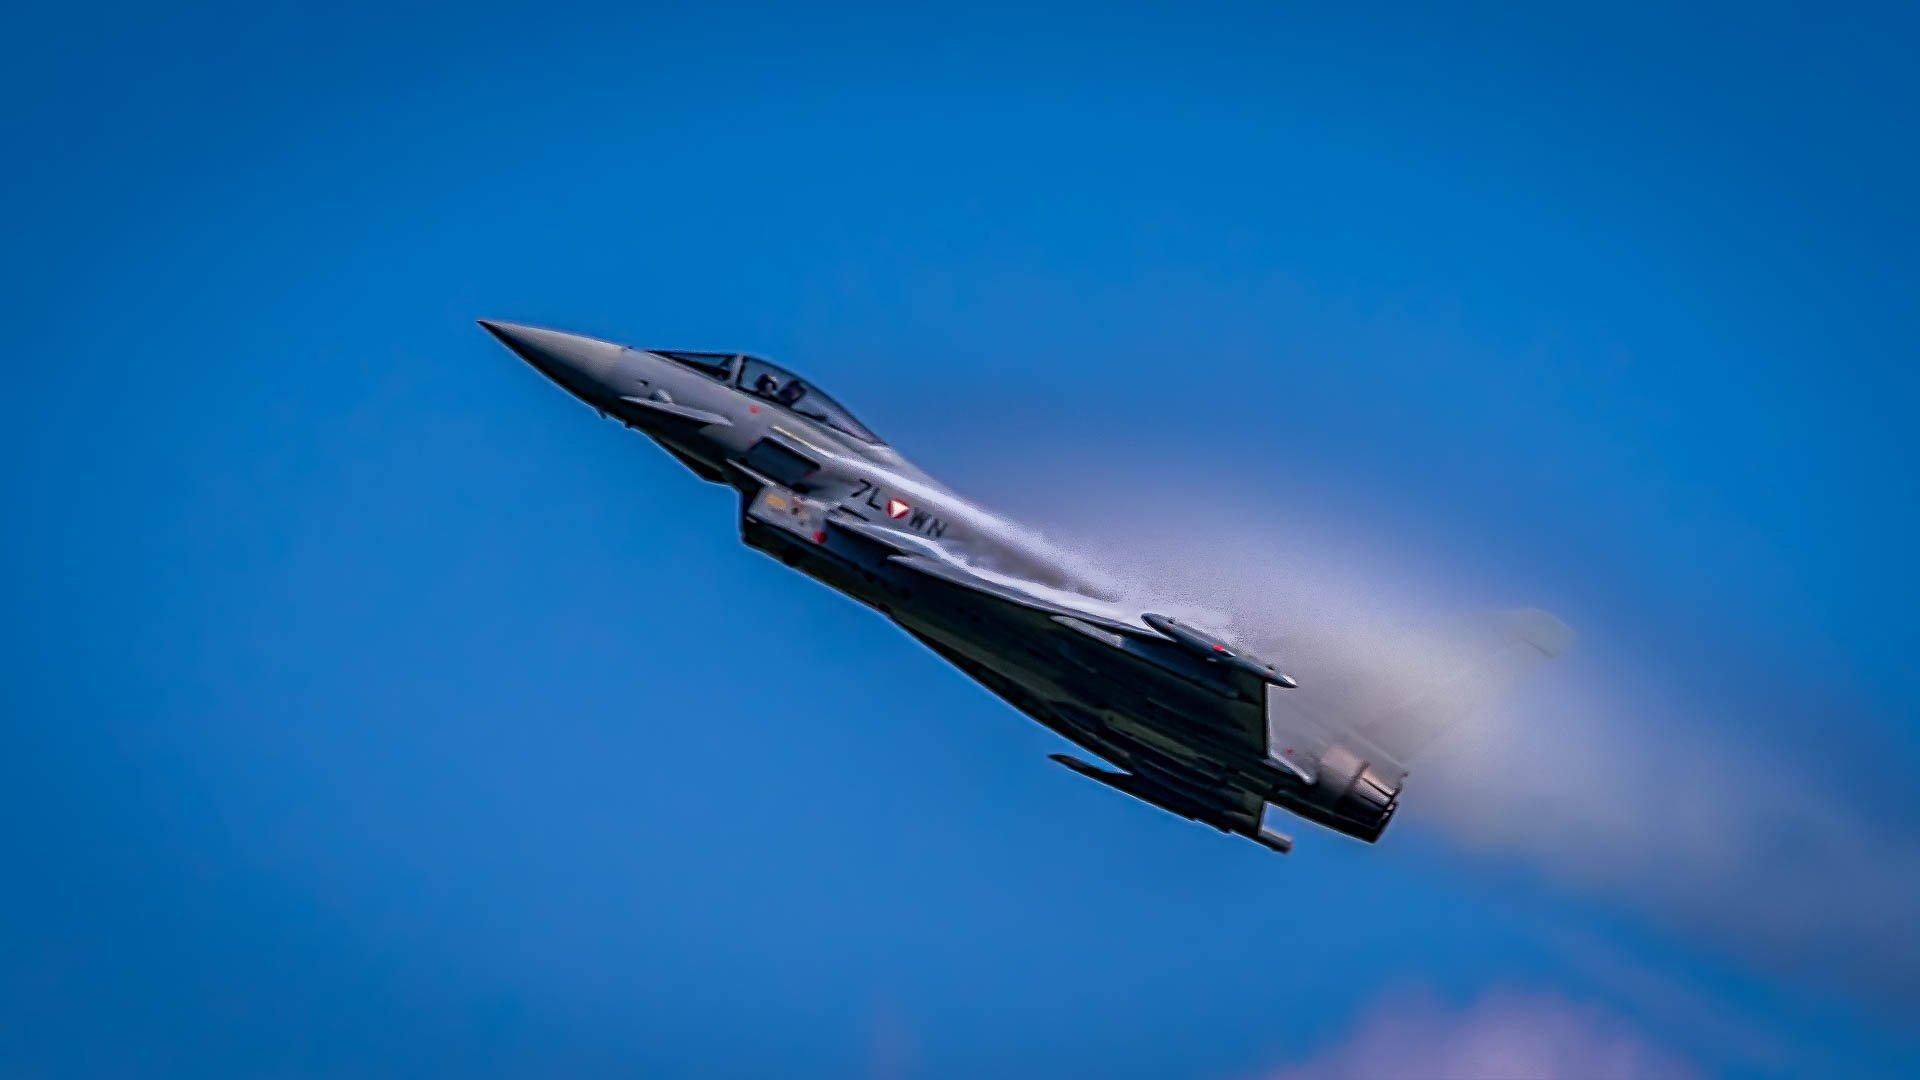 Eurofighter/Typhoon II